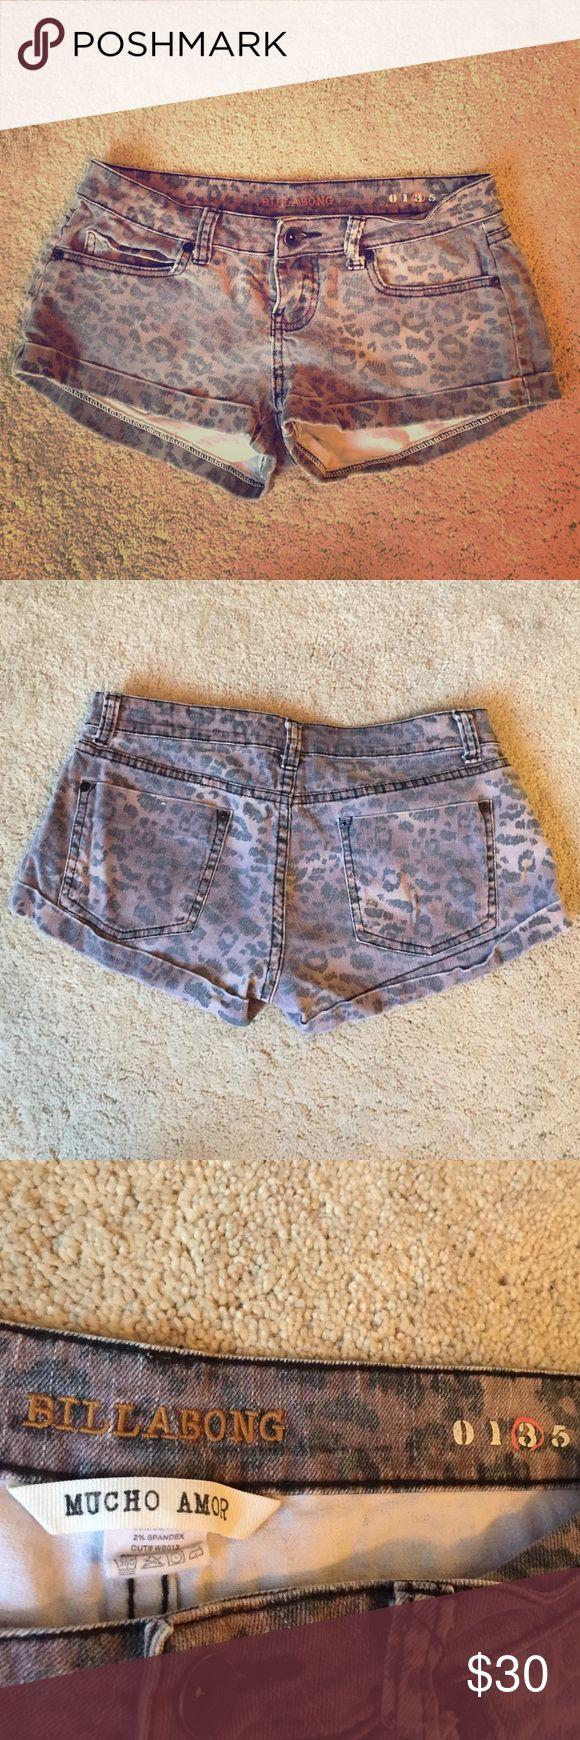 Billabong cheetah shorts Super cute billabong cheetah jean shorts! Very comfortable & perfect for going to the beach or going out. Billabong Shorts Jean Shorts